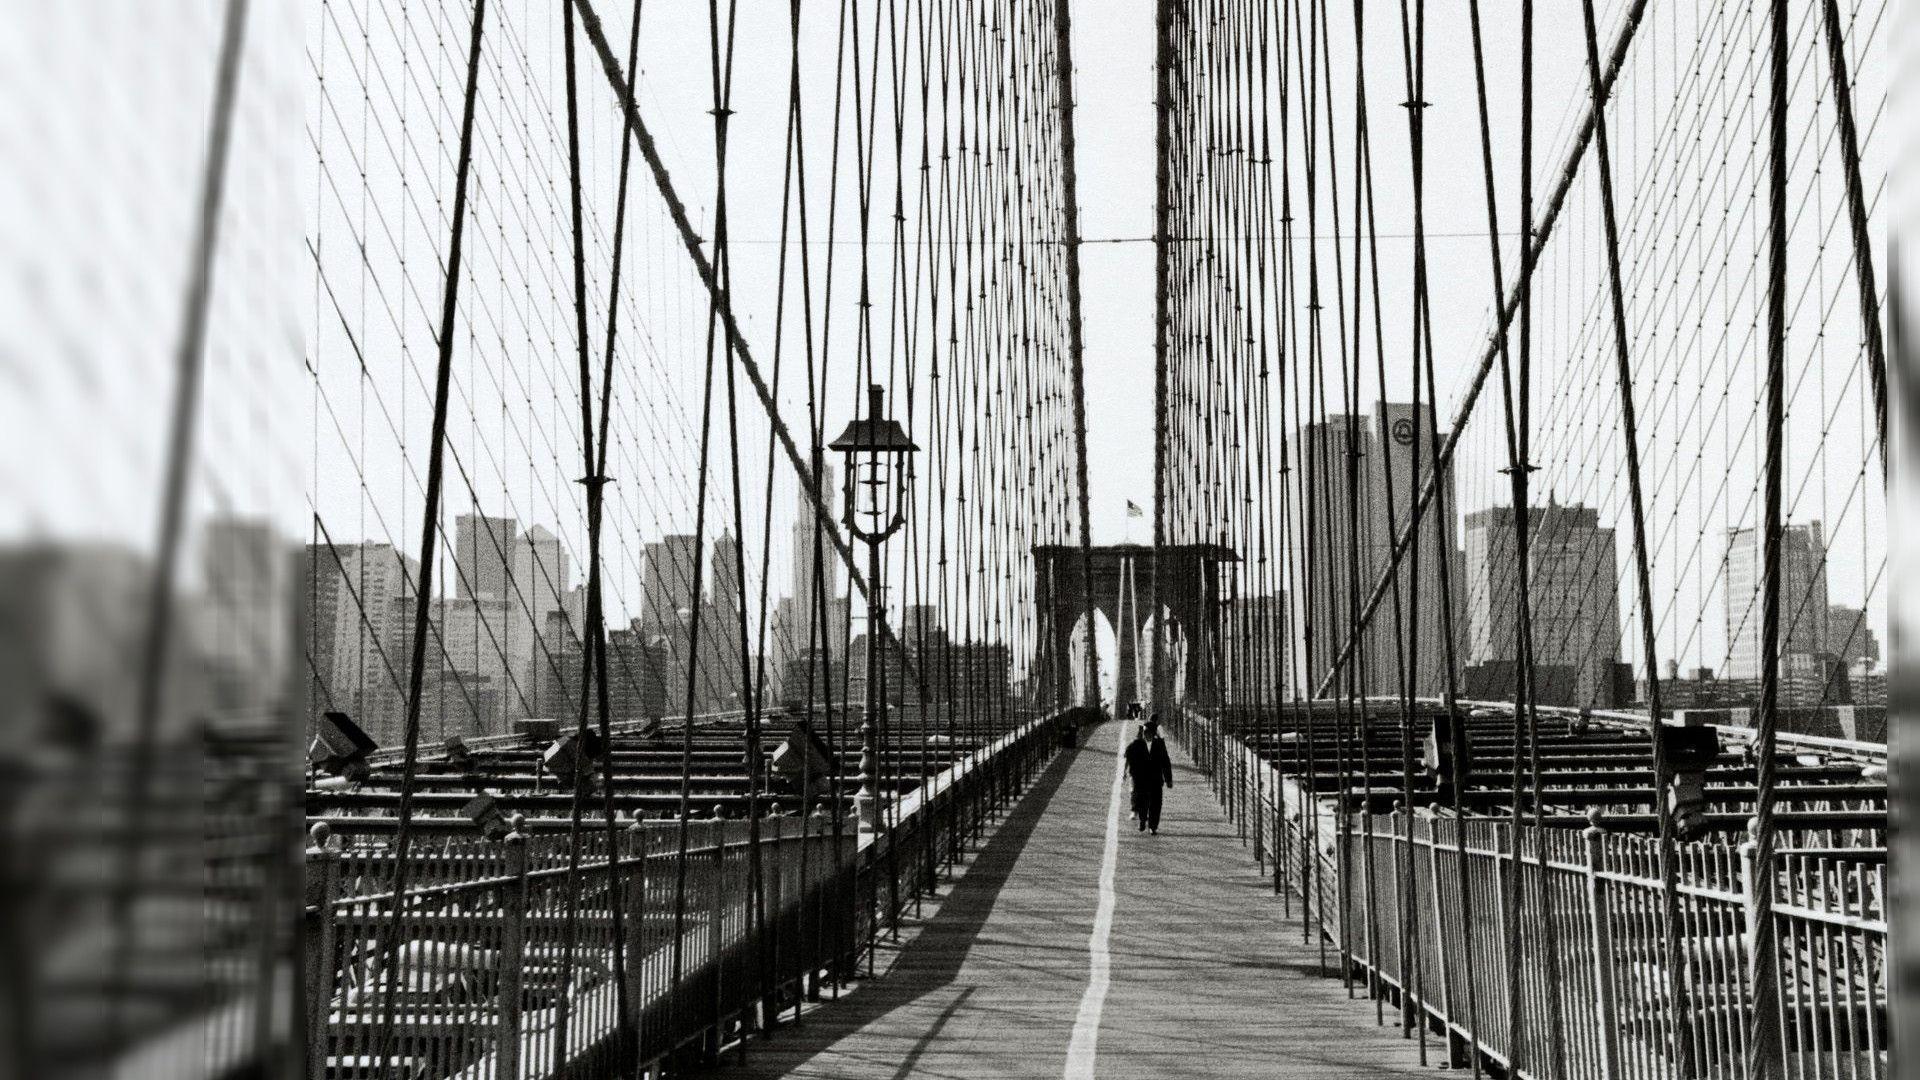 Brooklyn Bridge Wallpaper Black And White New York Wallpapers Desktop Wallpaper Cave